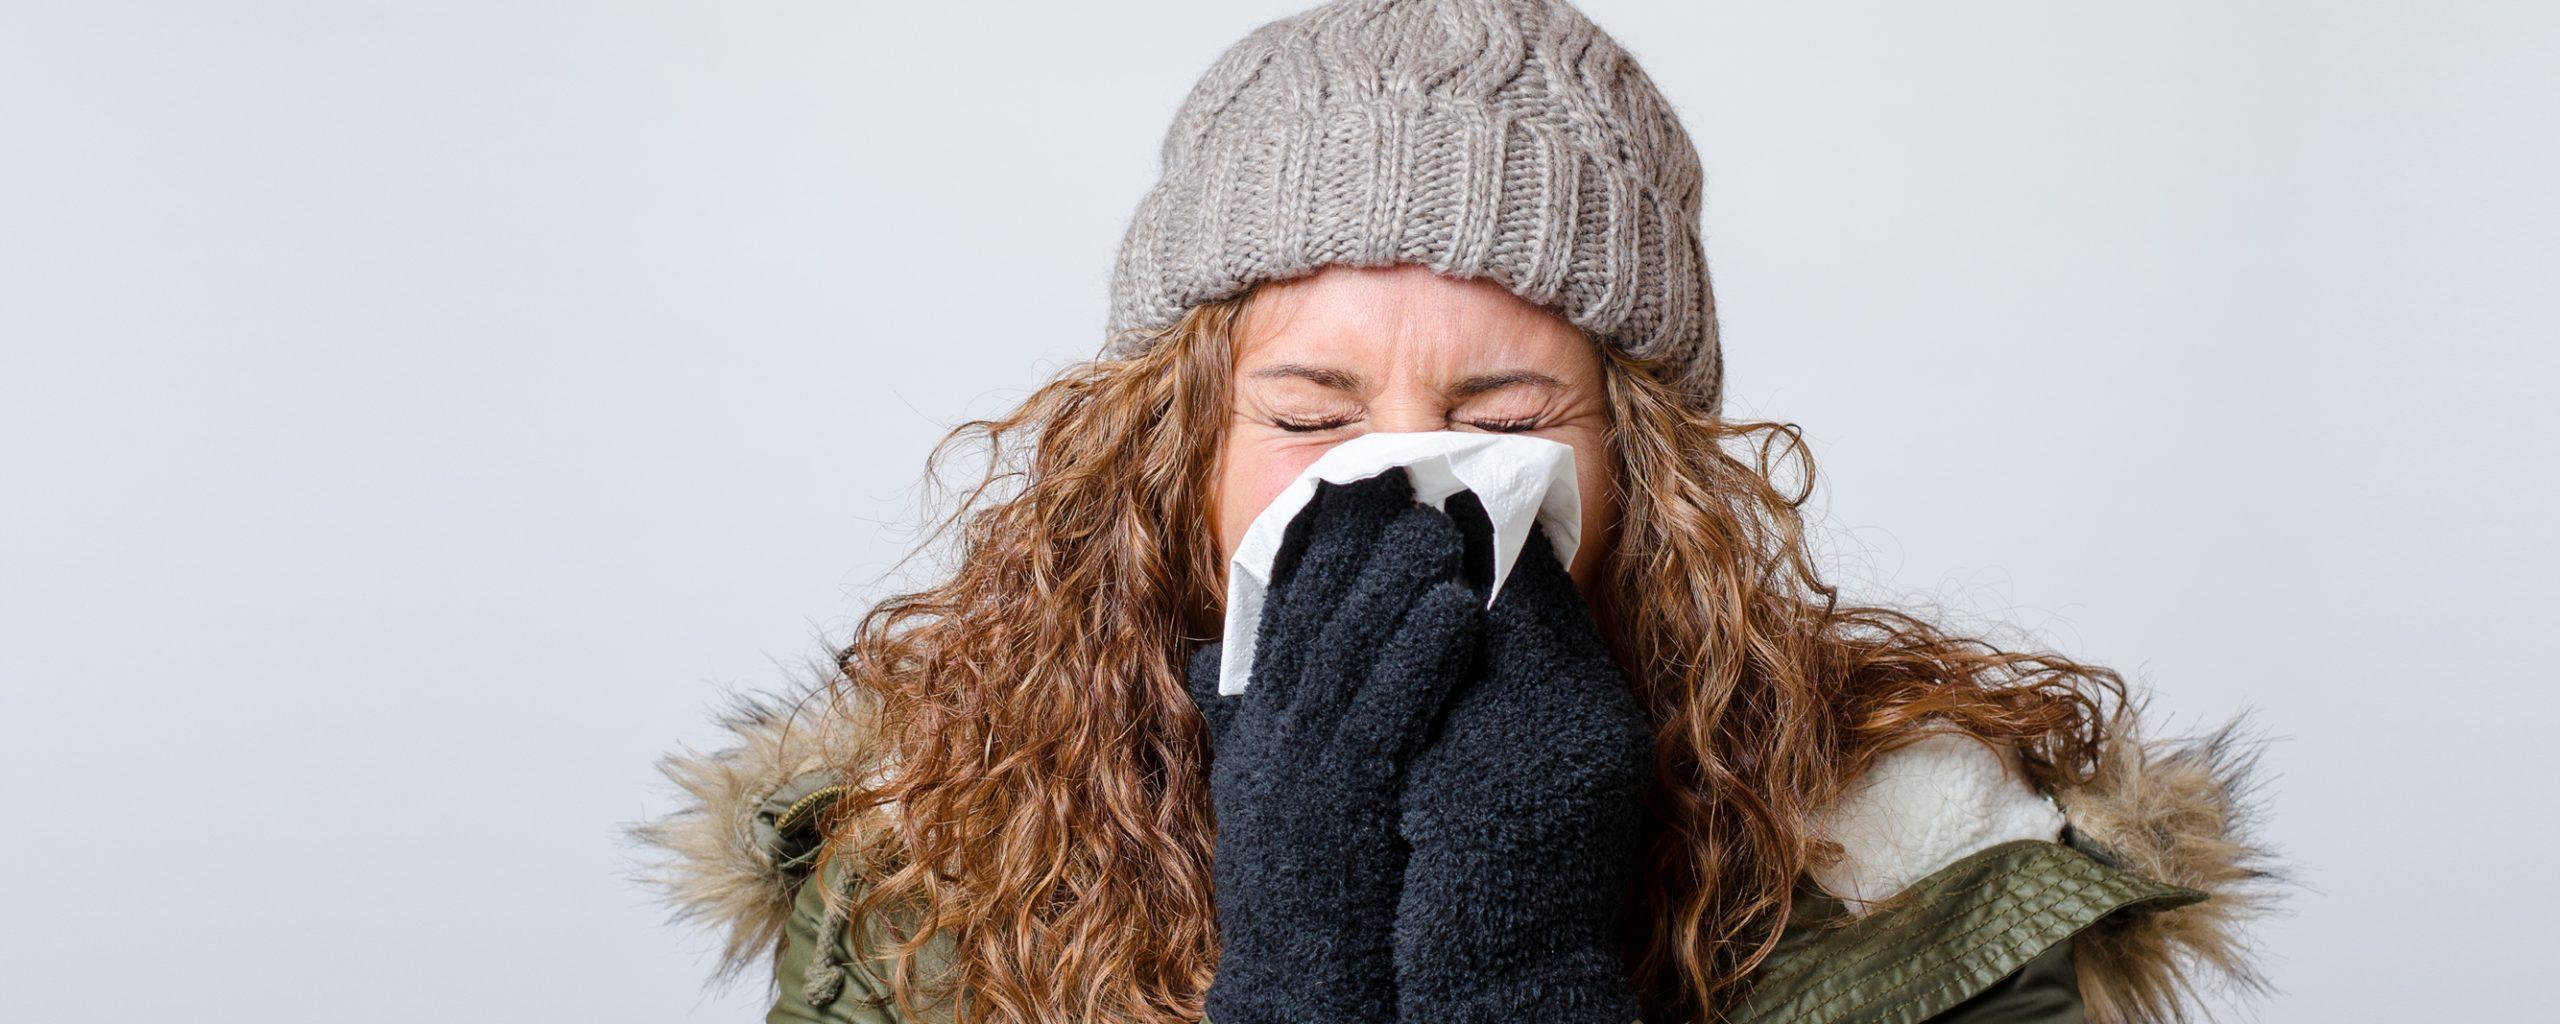 5 ways to stay healthy this flu season